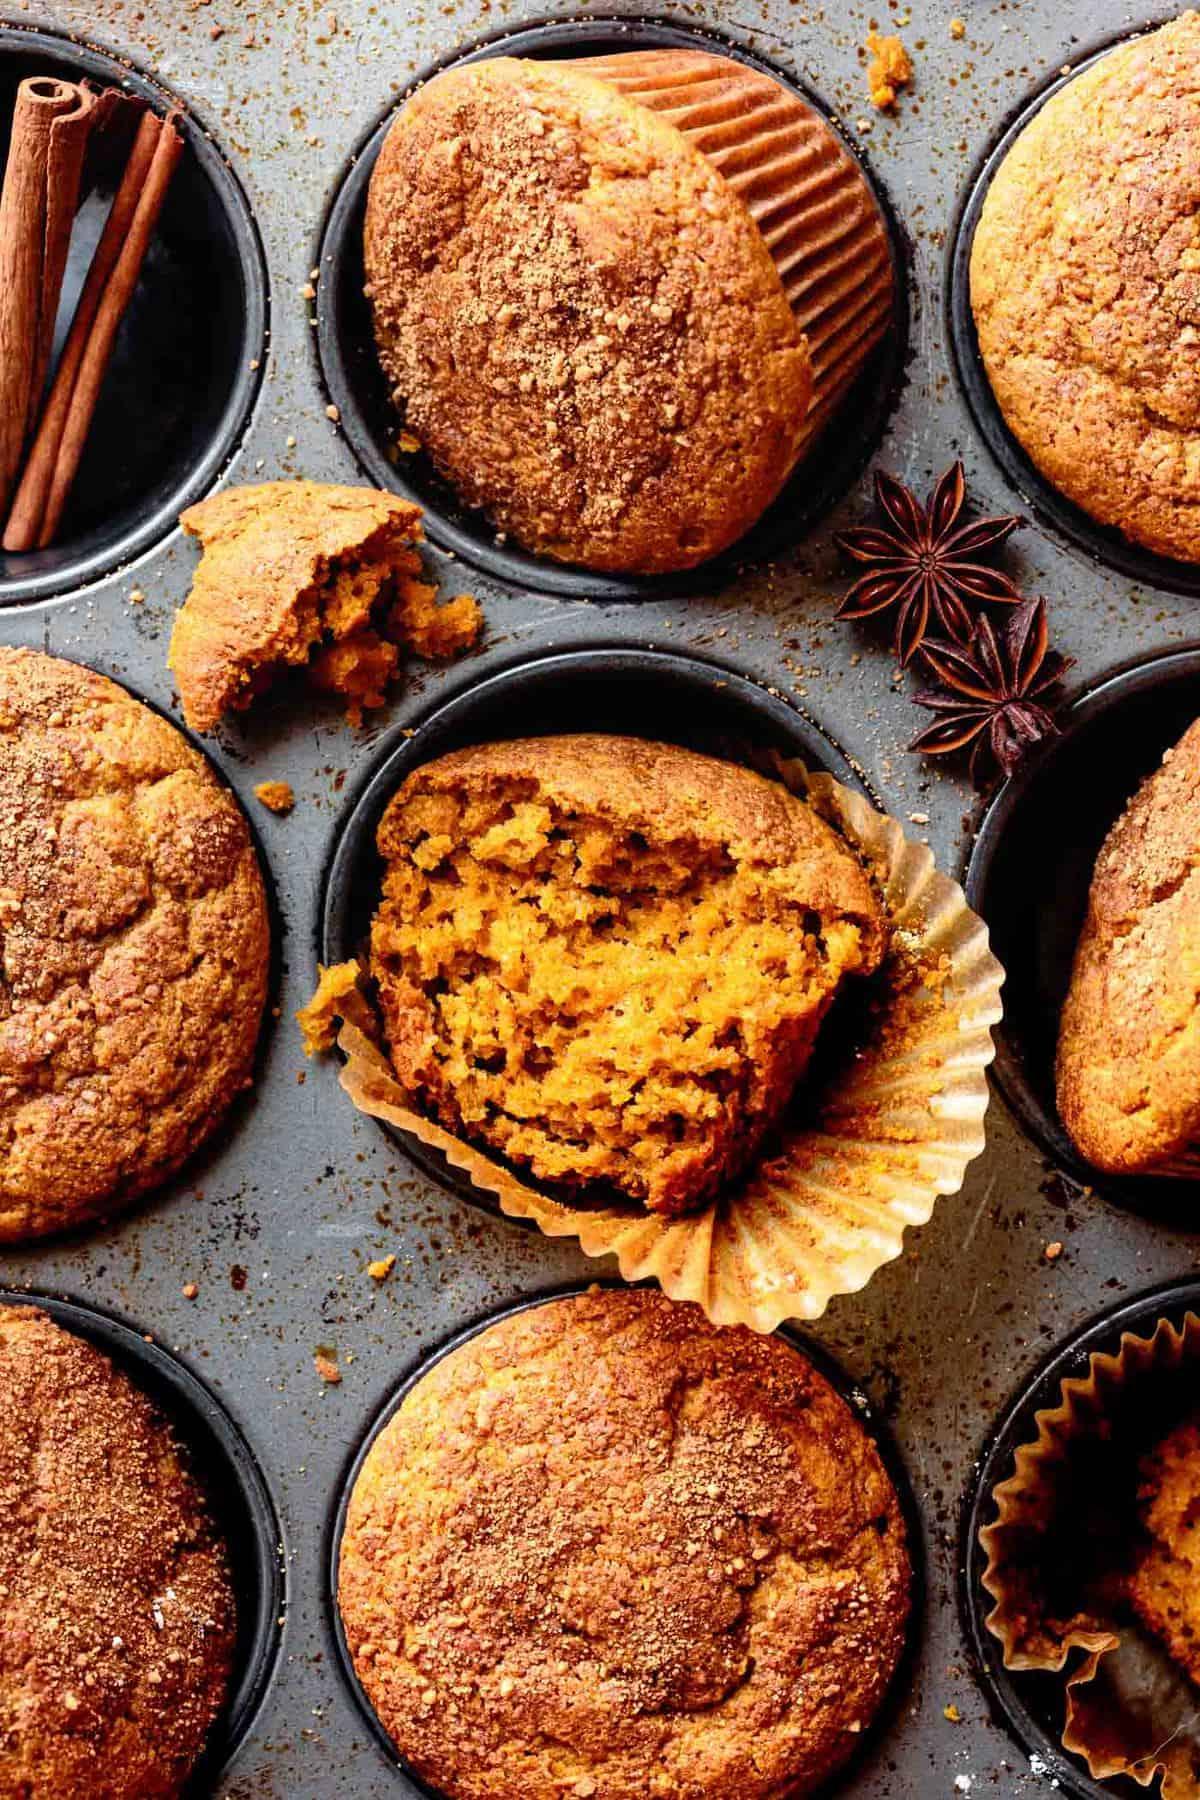 baked gluten-free pumpkin spice muffins in a tin with one broken in half